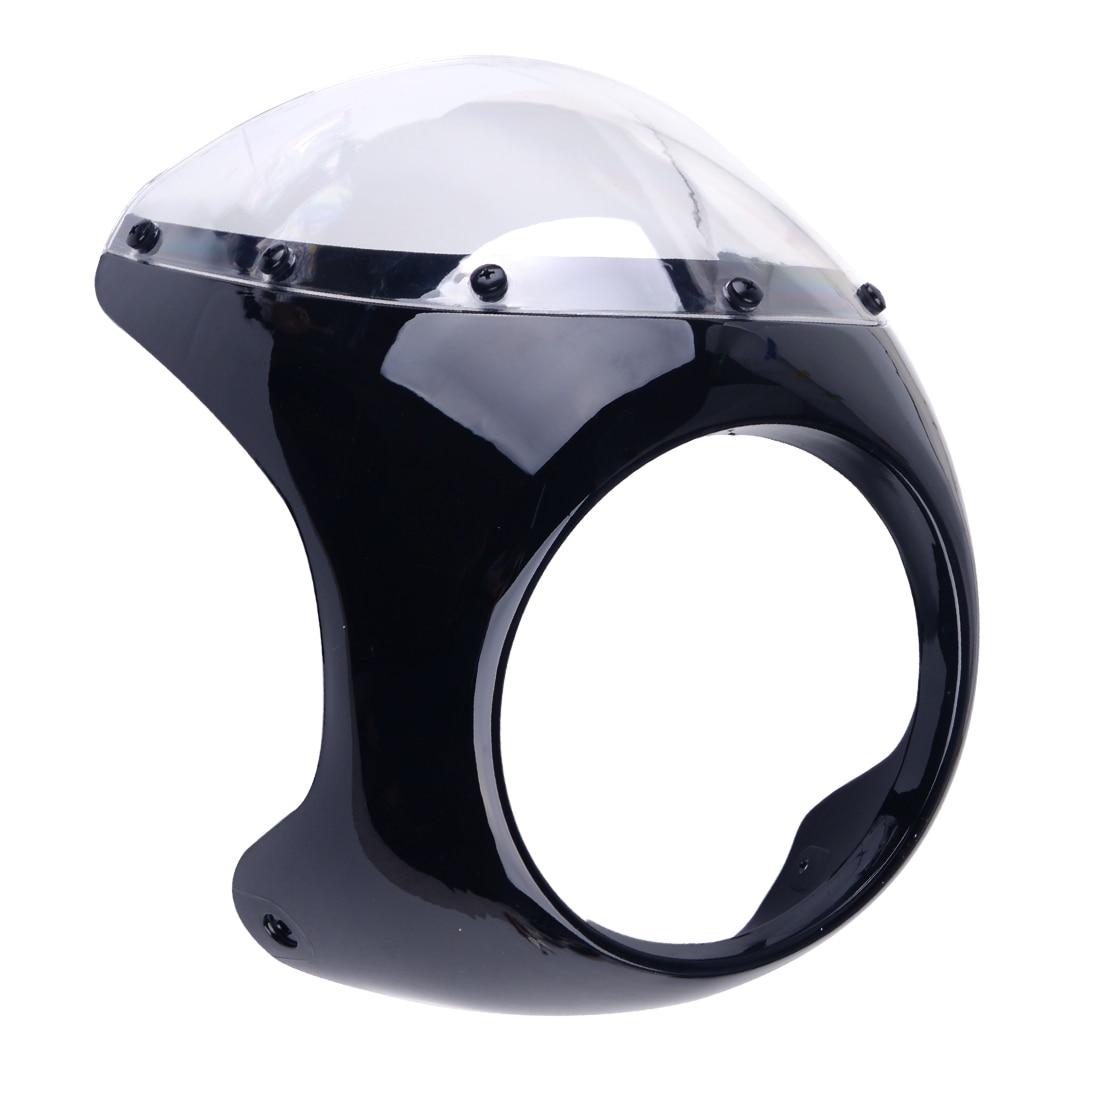 CITALL High Quality Motorcycle Black Plastic 17cm Headlight Fairing Screen Retro Cafe Racer Style Drag Racing